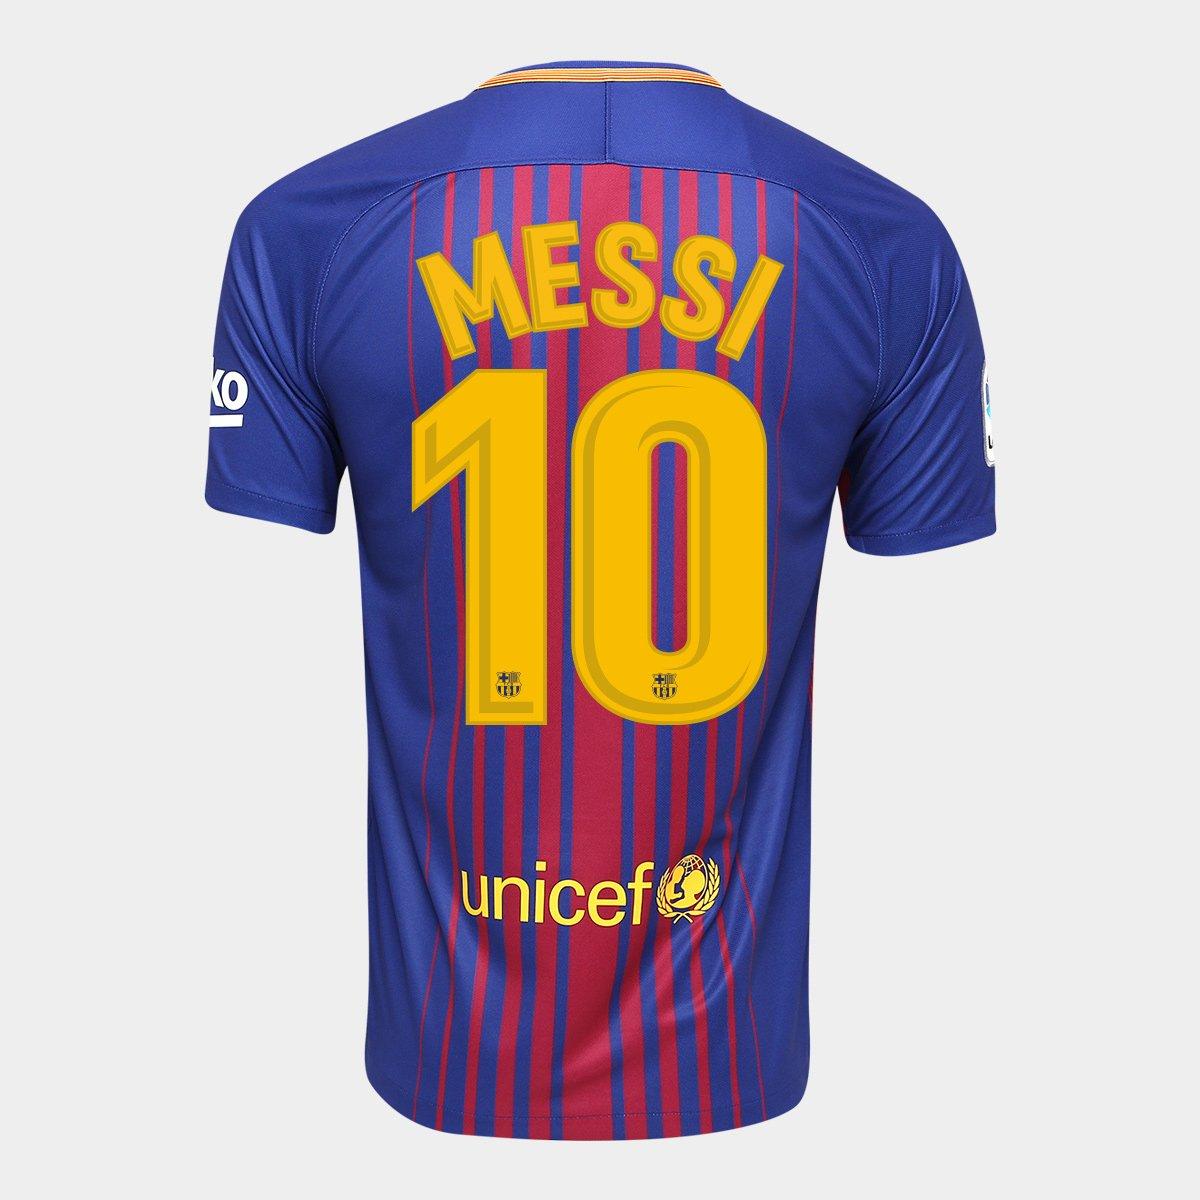 4d000336181ba Camisa Barcelona Home 17 18 Nº 10 Messi Torcedor Nike Masculina - Compre  Agora